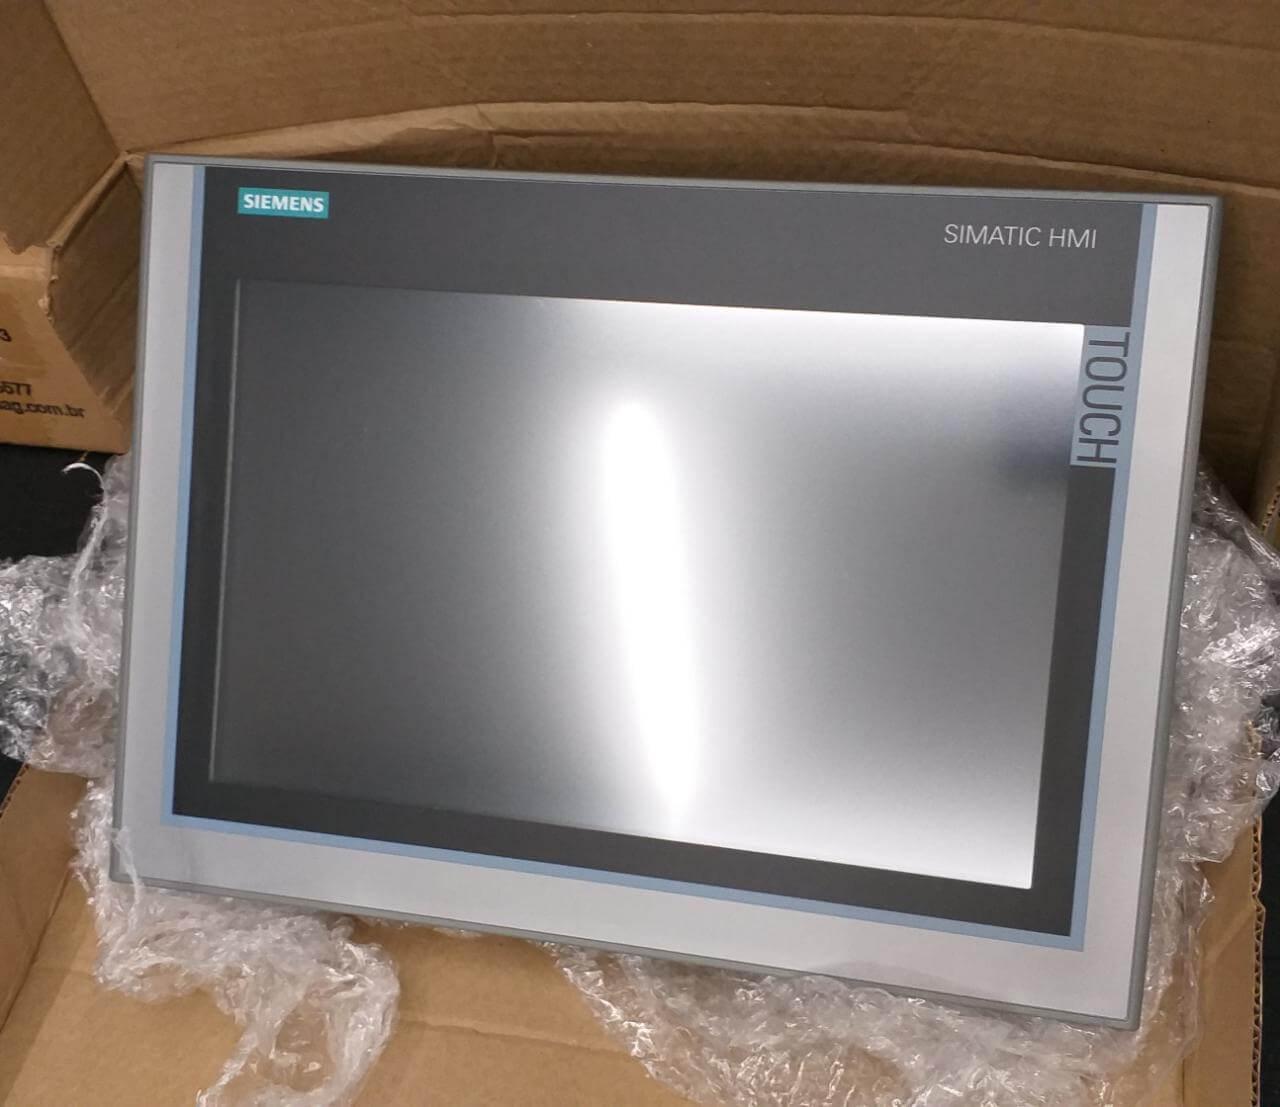 6AV2124-0MC01-0AX0|IHM SIMATIC TP1200|SIEMENS